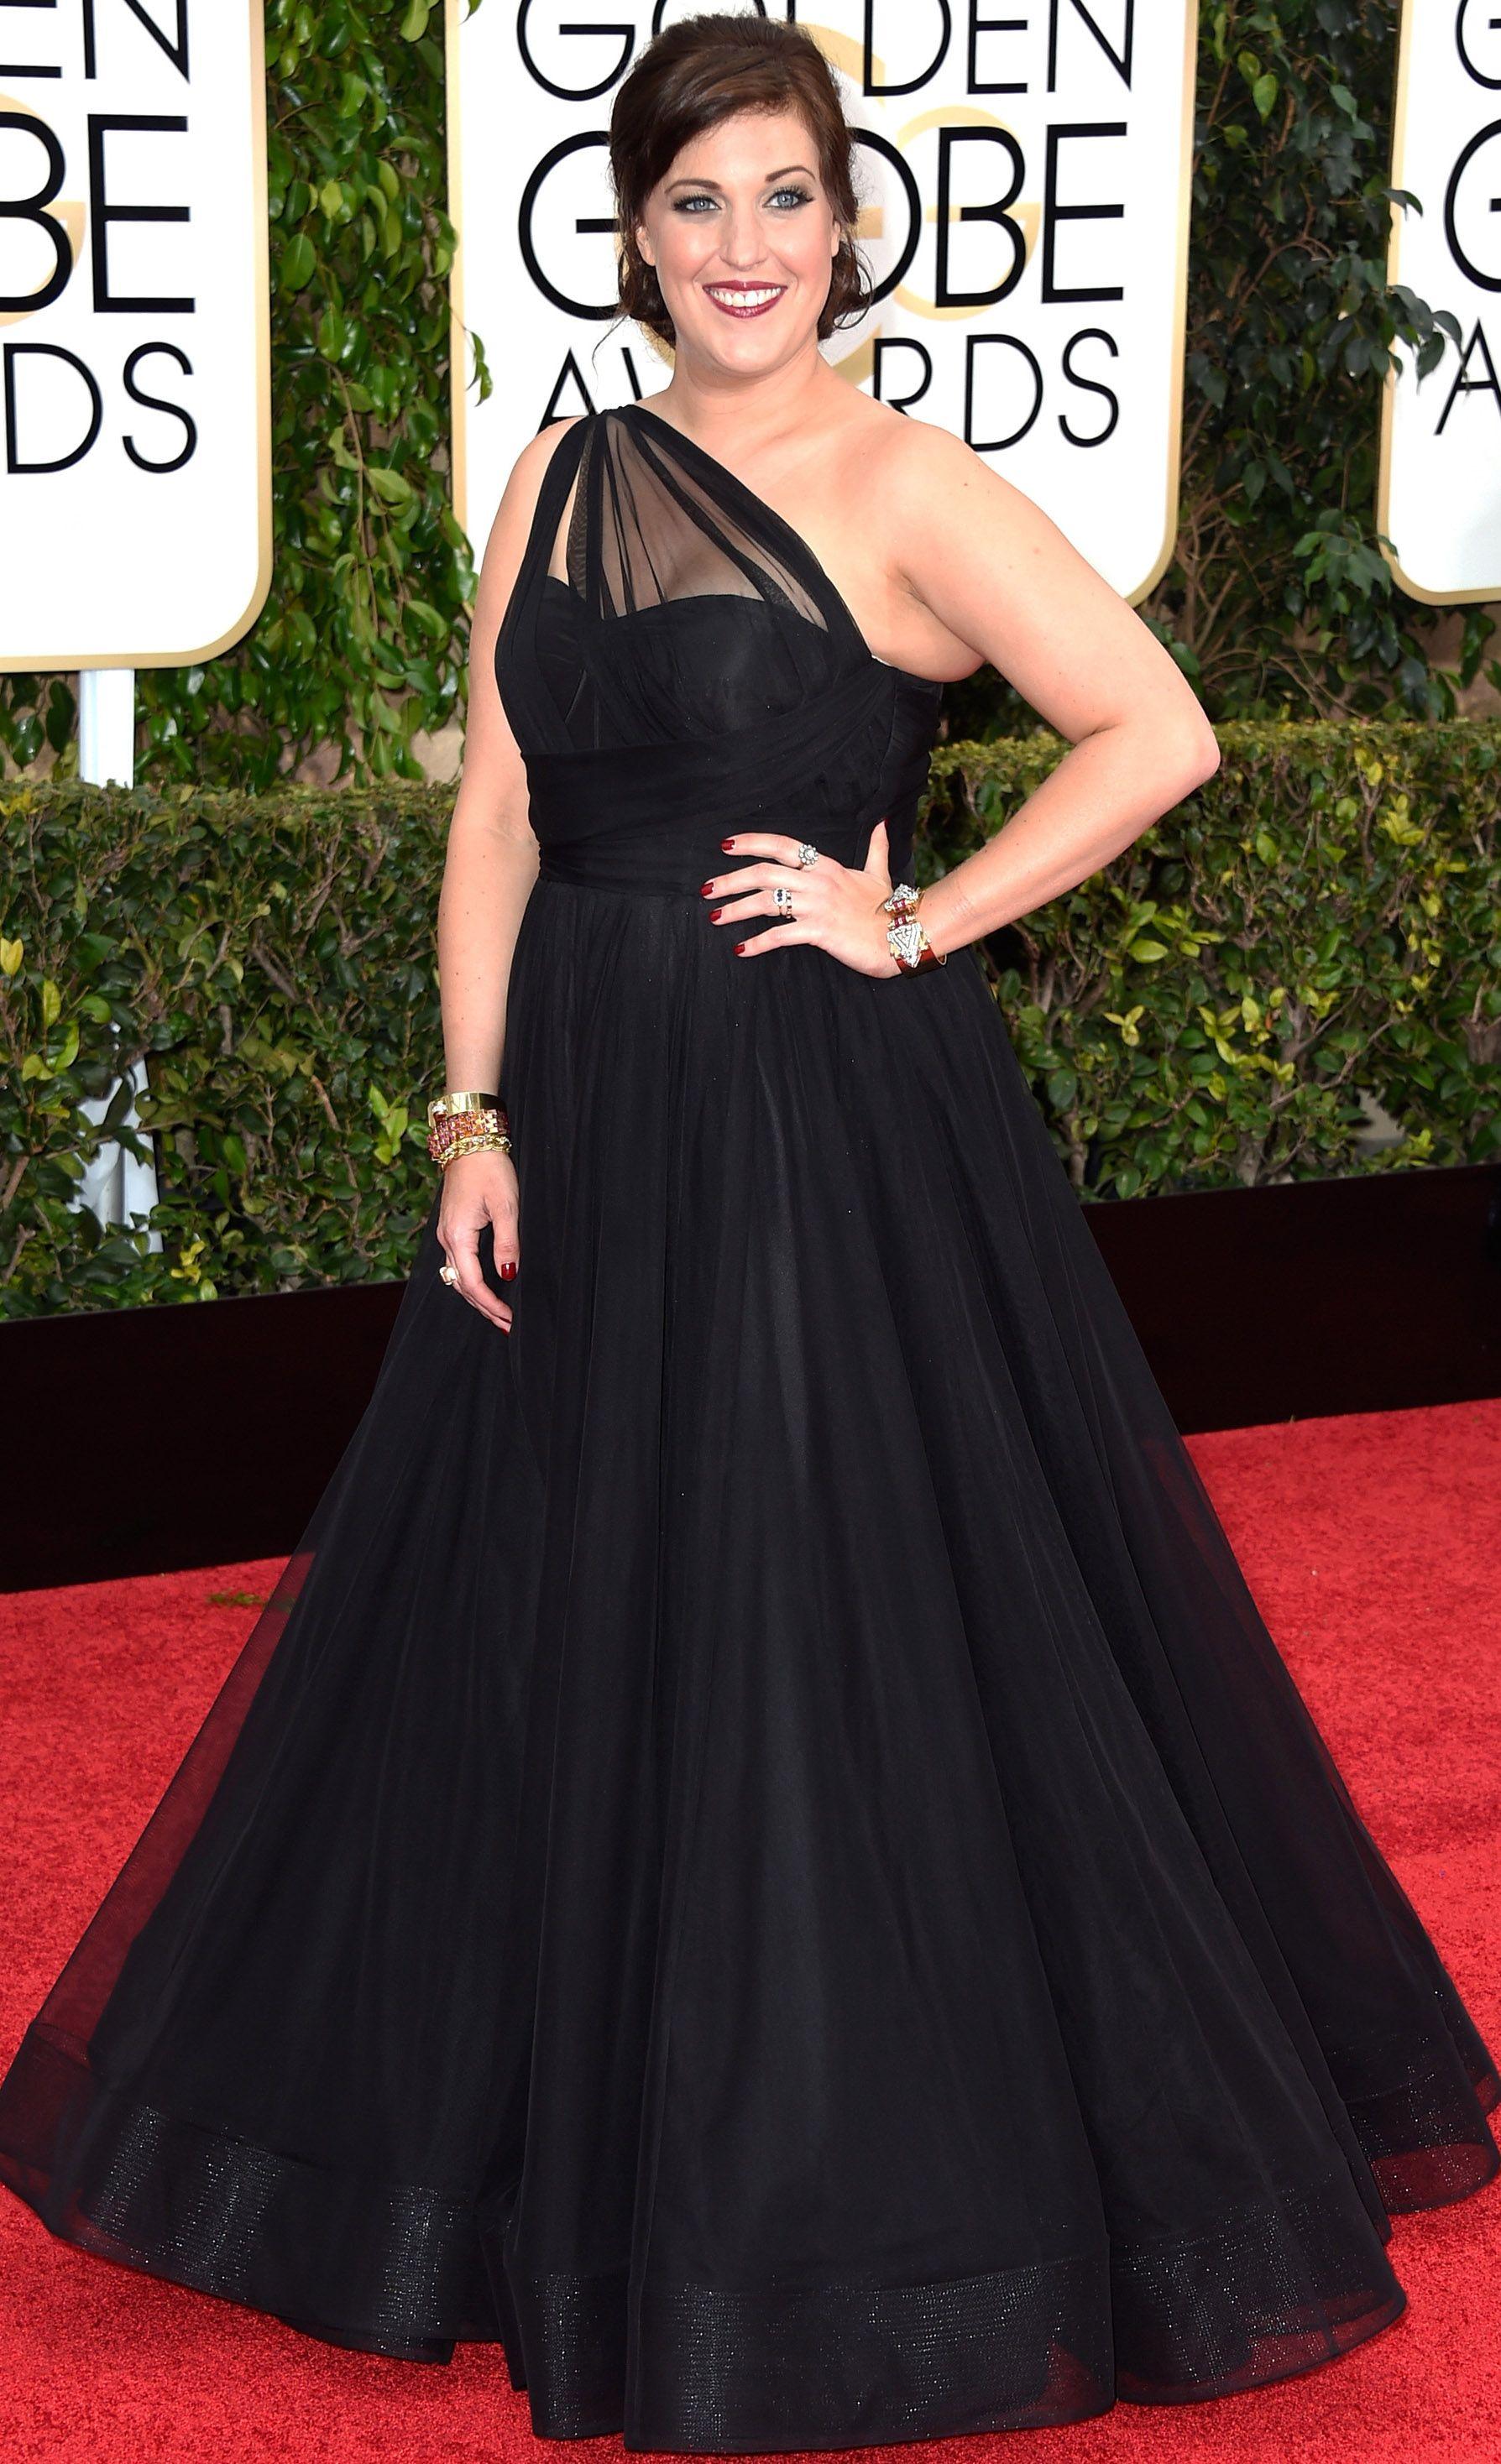 Allison Tolman - 72nd annual Golden Globe Awards, arrivals (January 11)